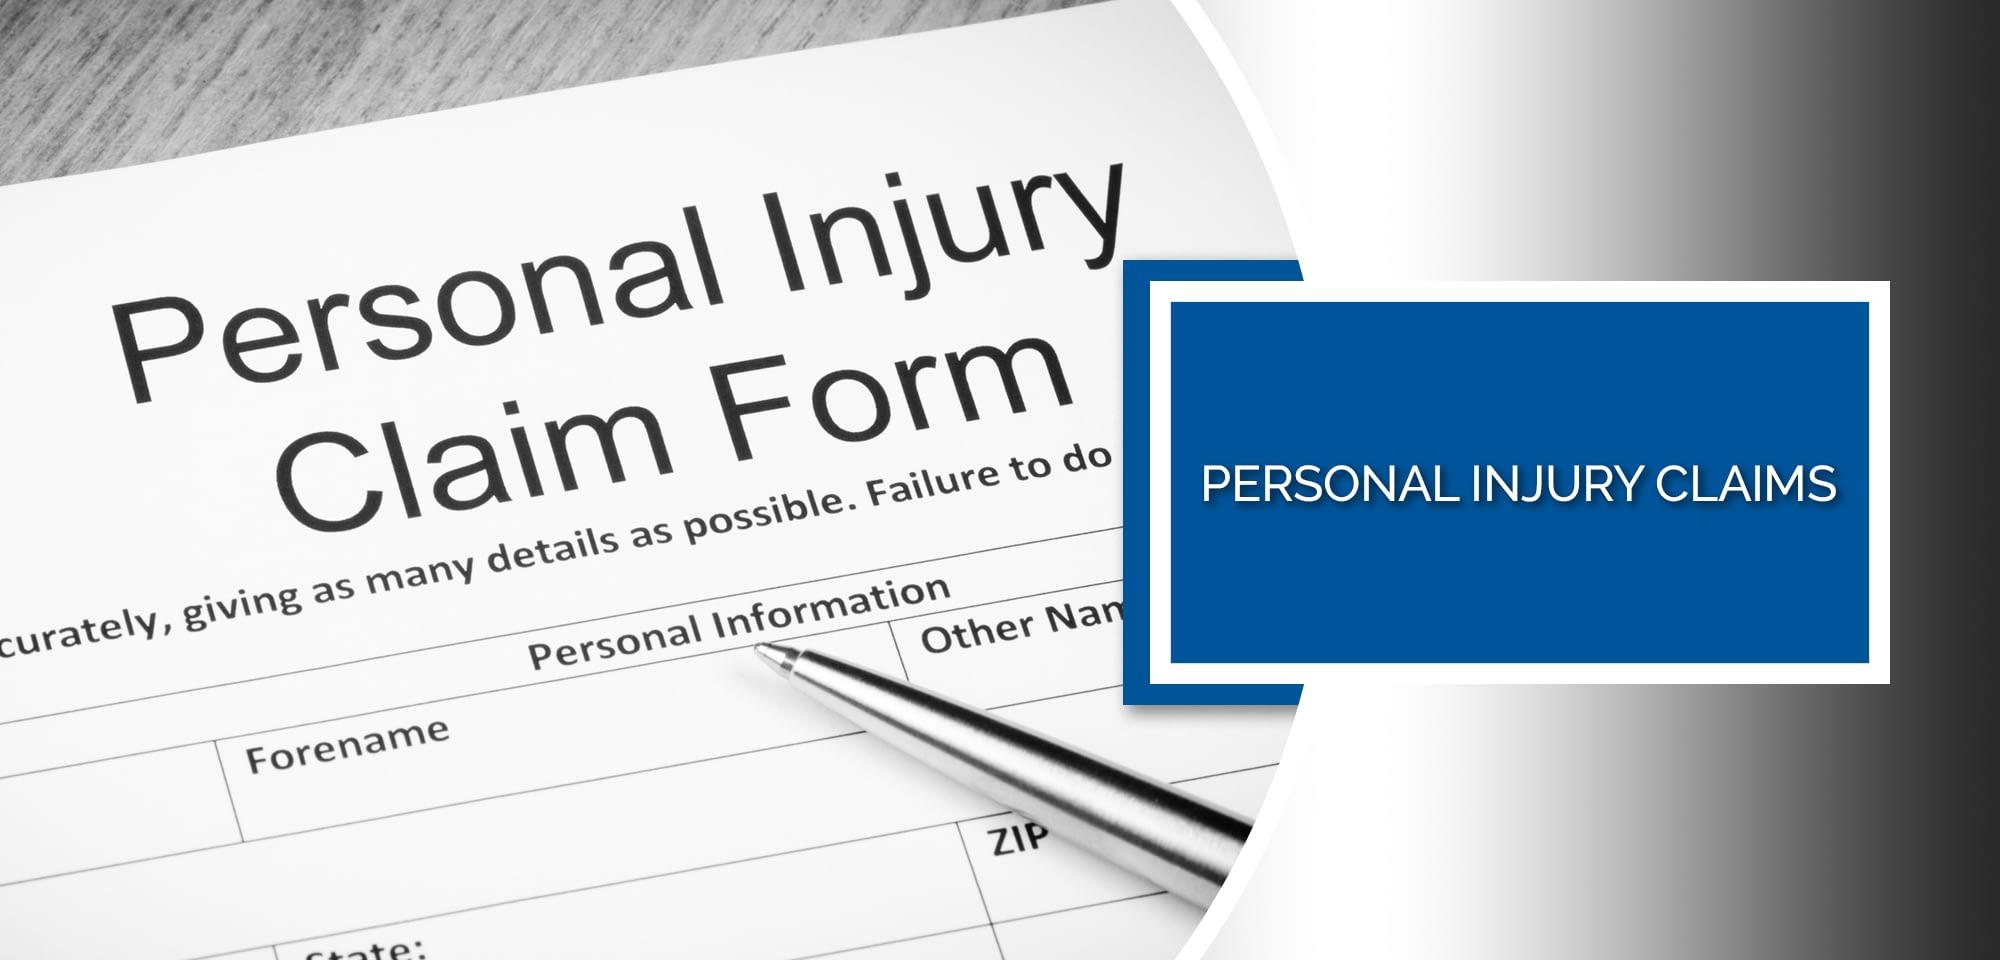 hda-faq-personal-injury-claims-2000×1125